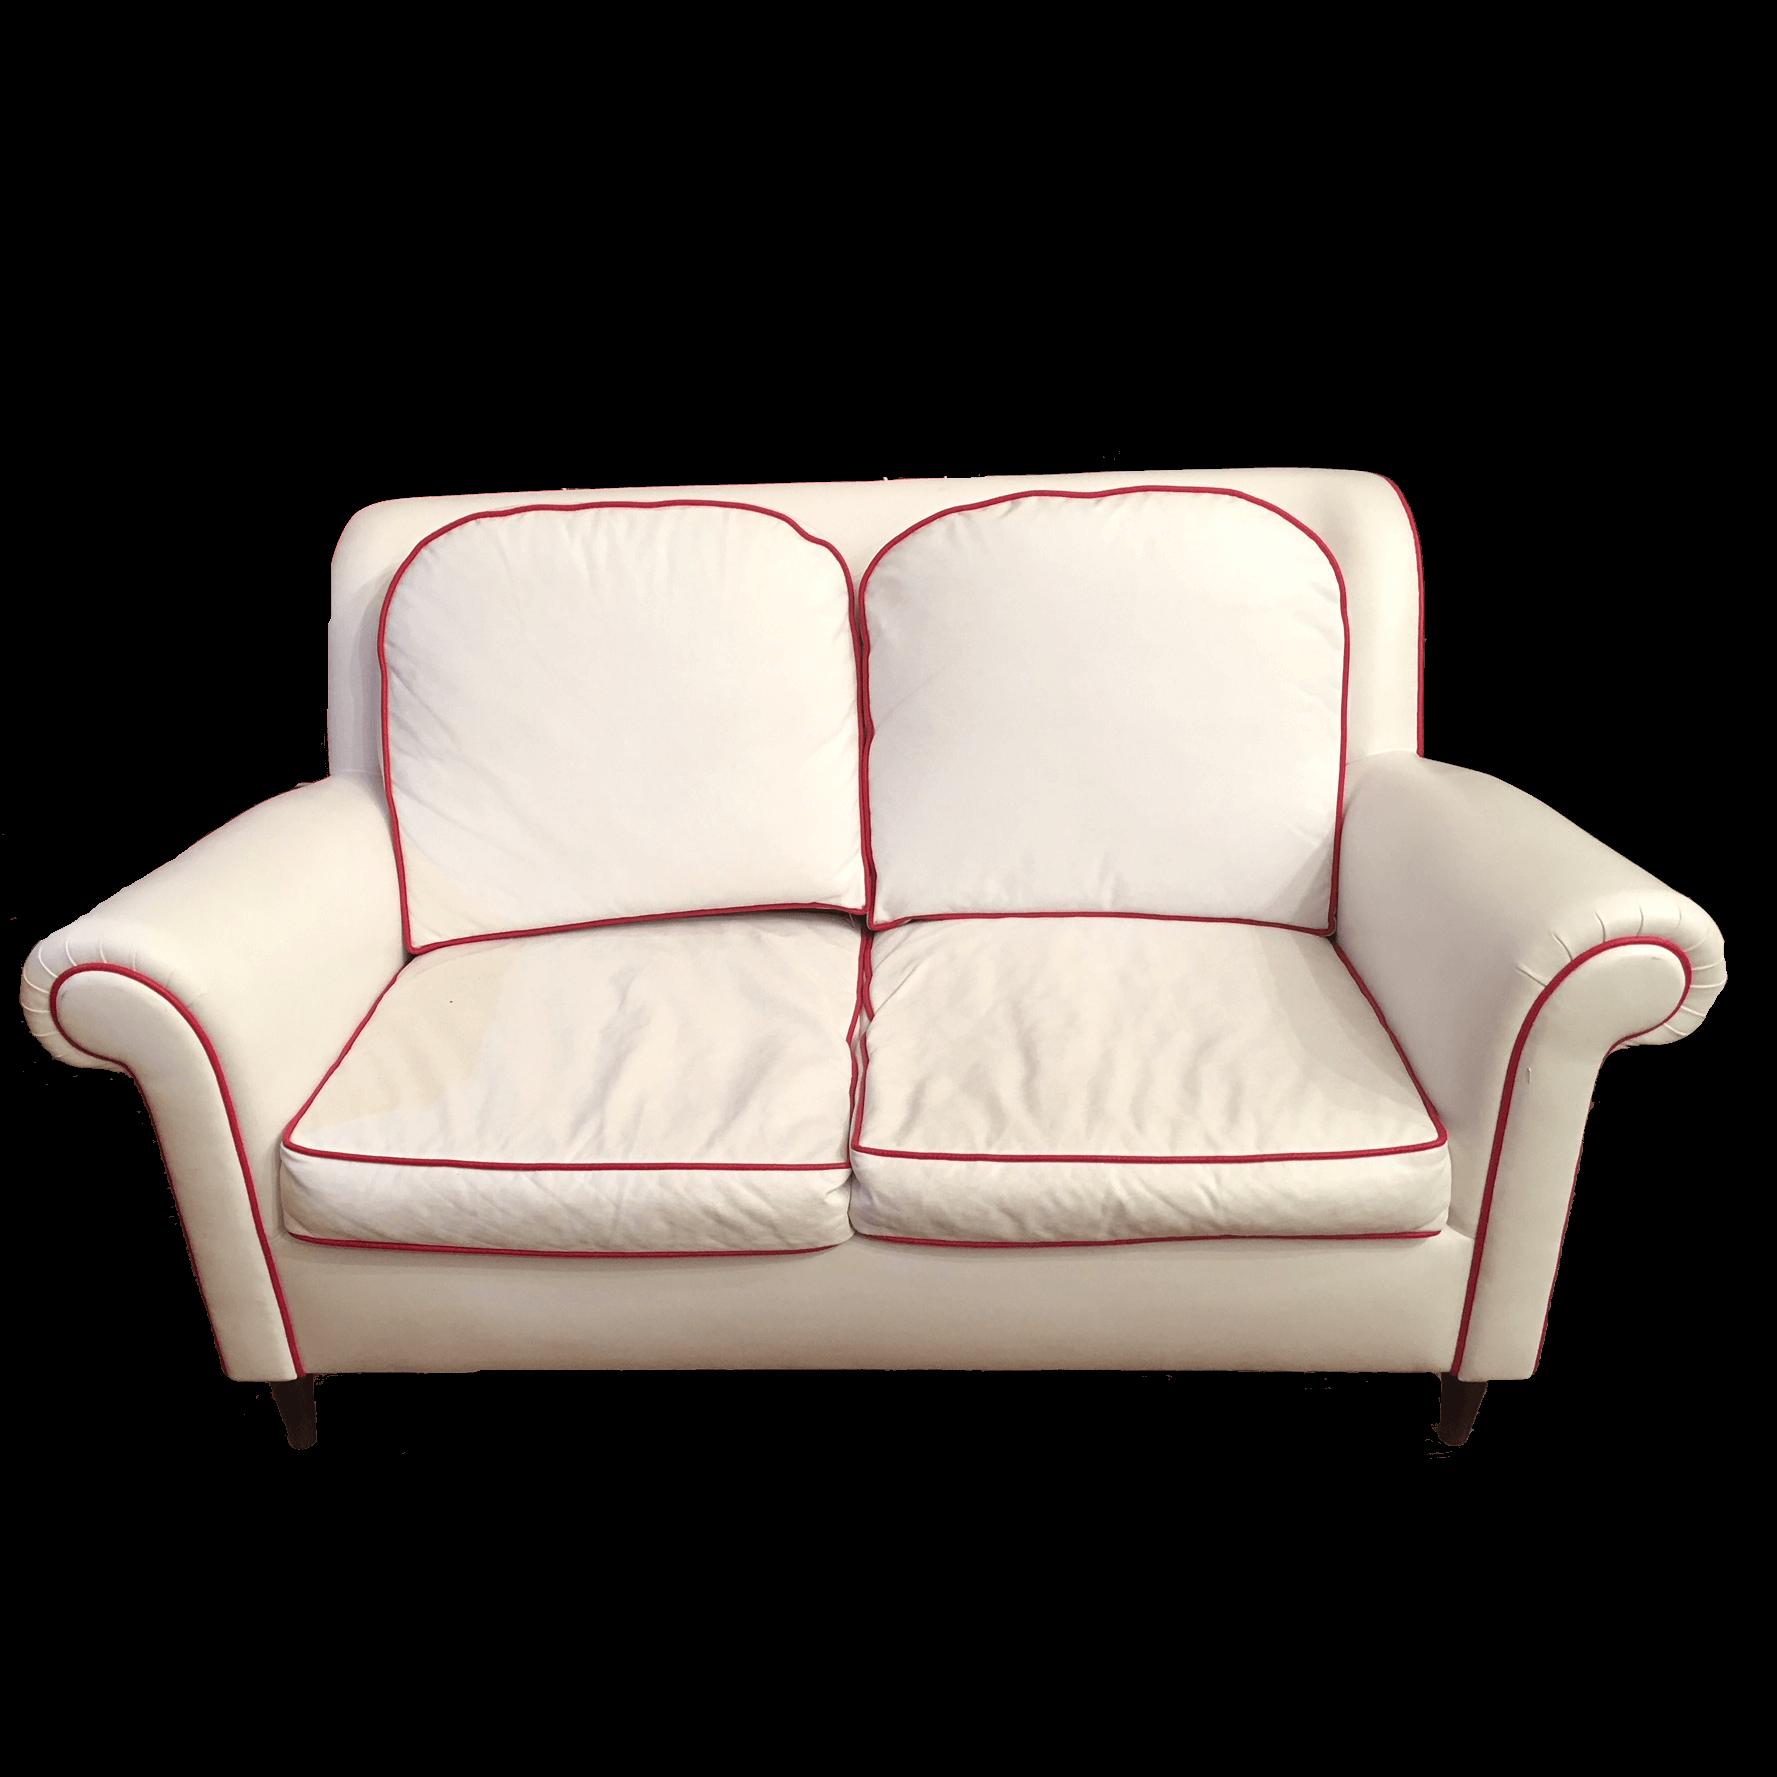 Divano in eco pelle bianco divani vintage bogys50s - Divano in pelle bianco ...